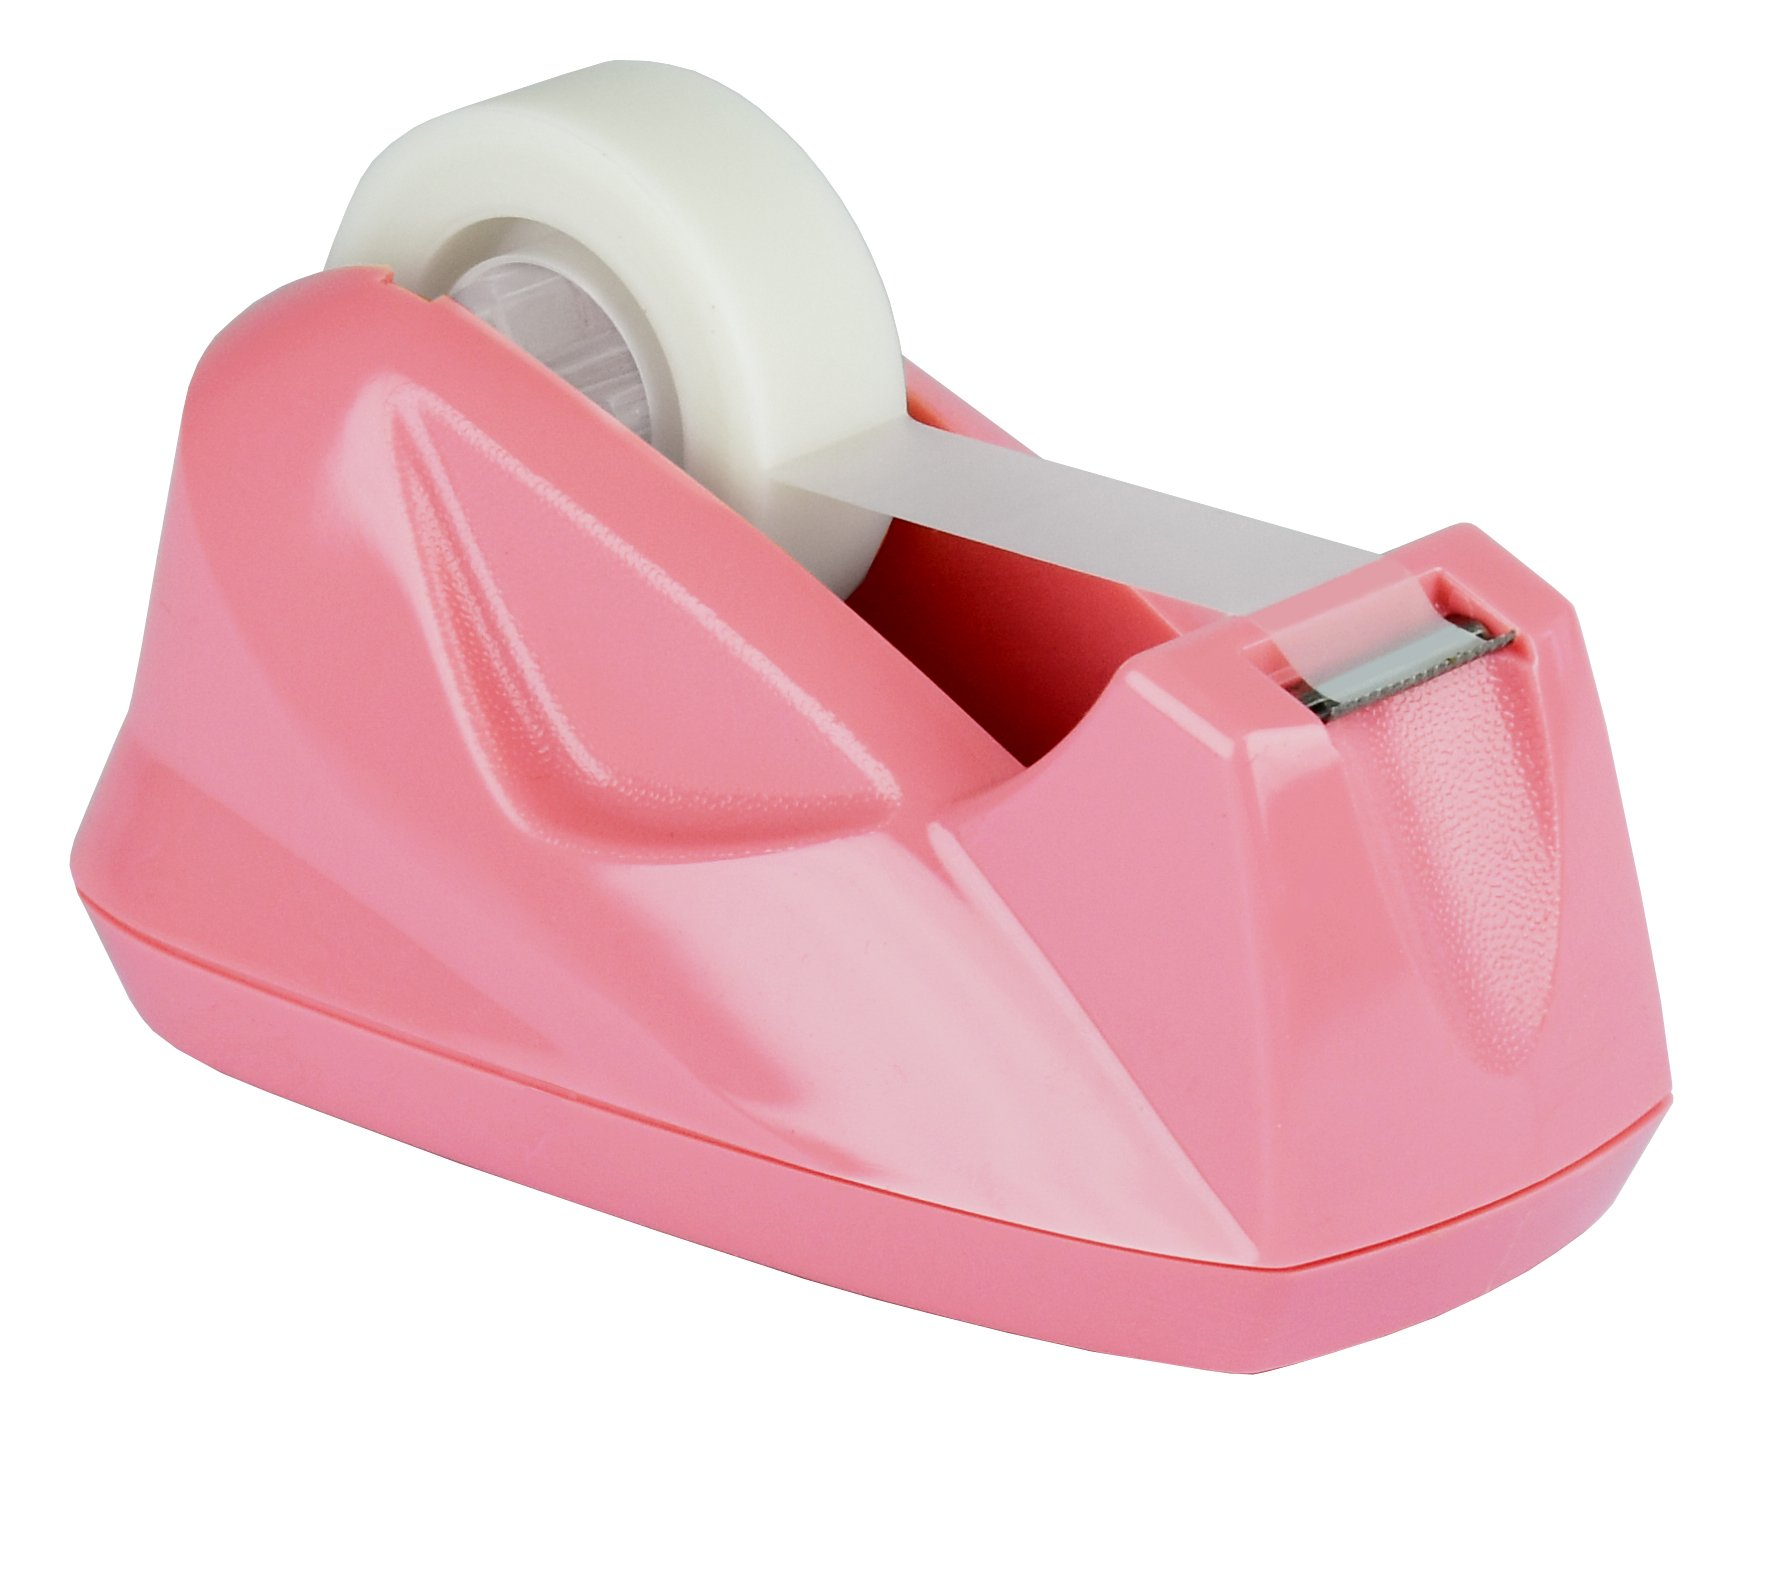 Acrimet Premium Tape Dispenser (Pink Color) by Acrimet (Image #1)